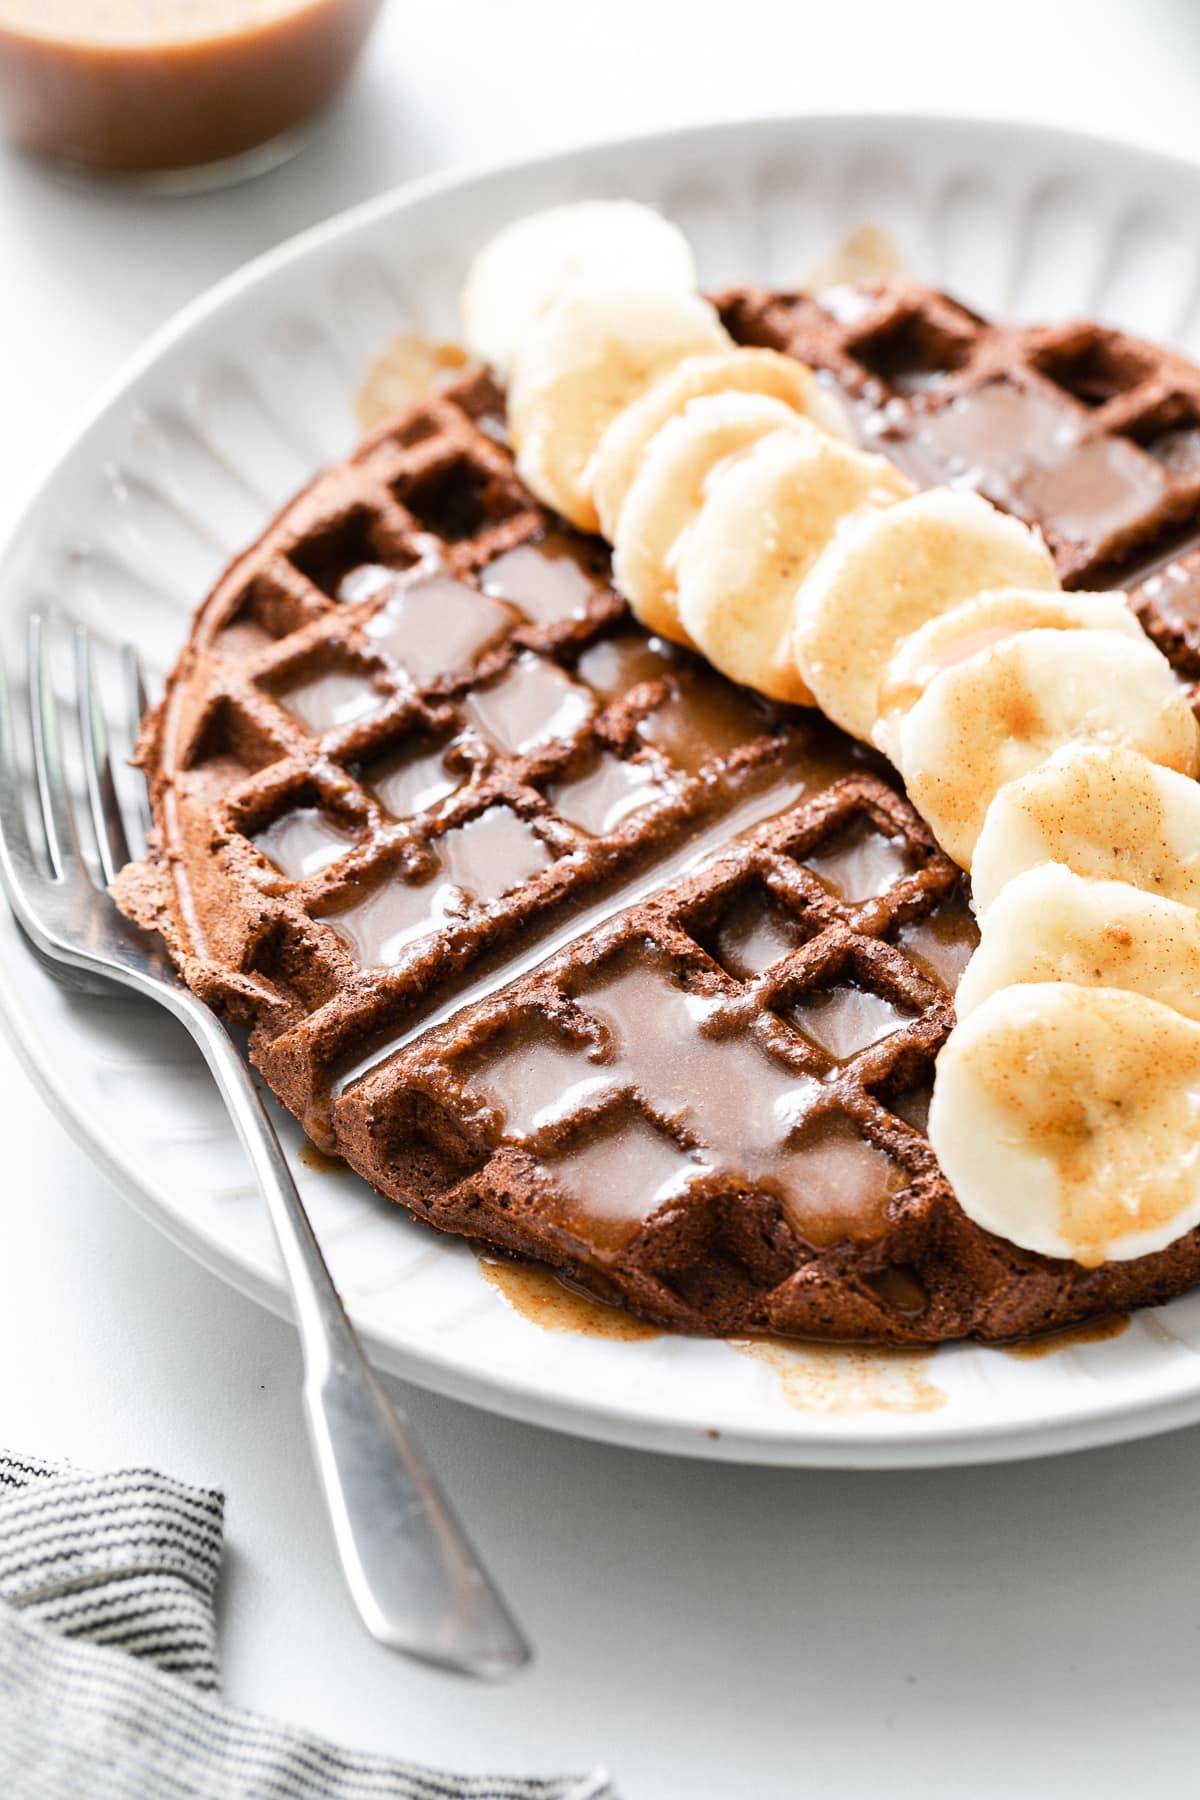 side angle view of chocolate vegan buckwheat waffles with banana and syrup.